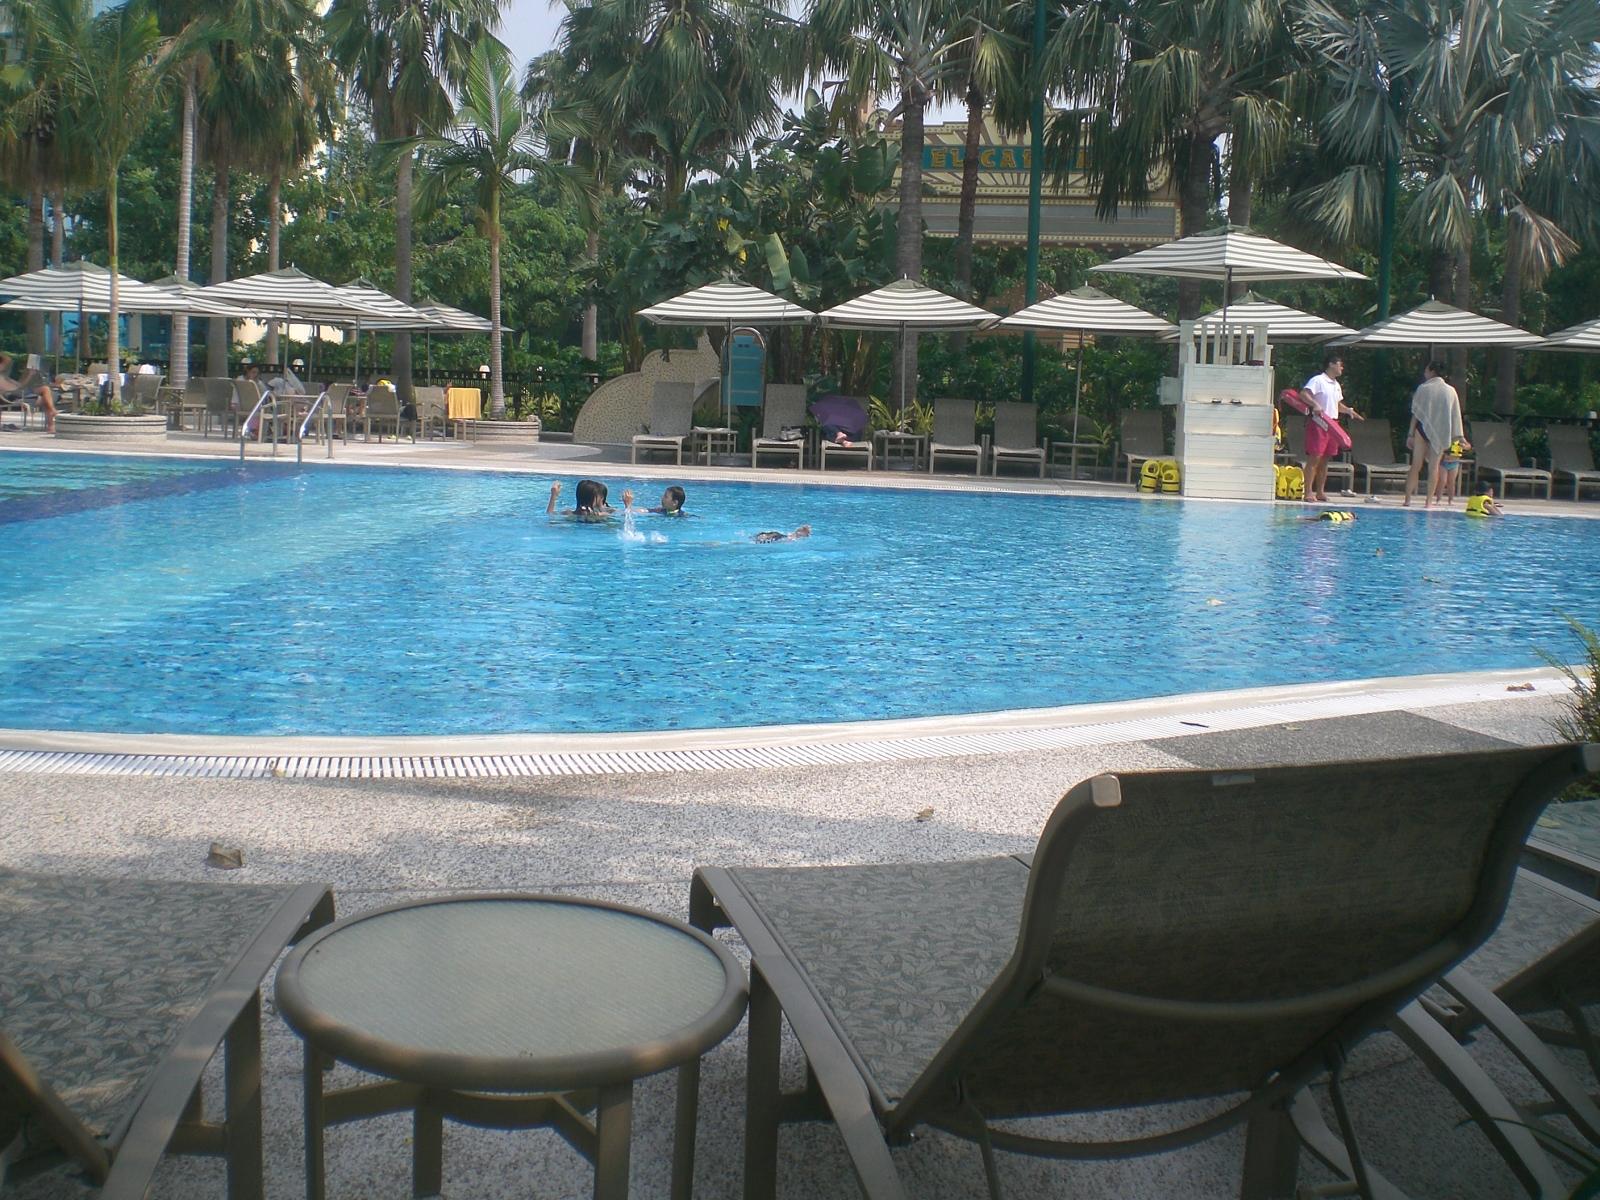 File Hk Disney 39 S Hollywood Hotel Swimming Pool 02 Jpg Wikimedia Commons